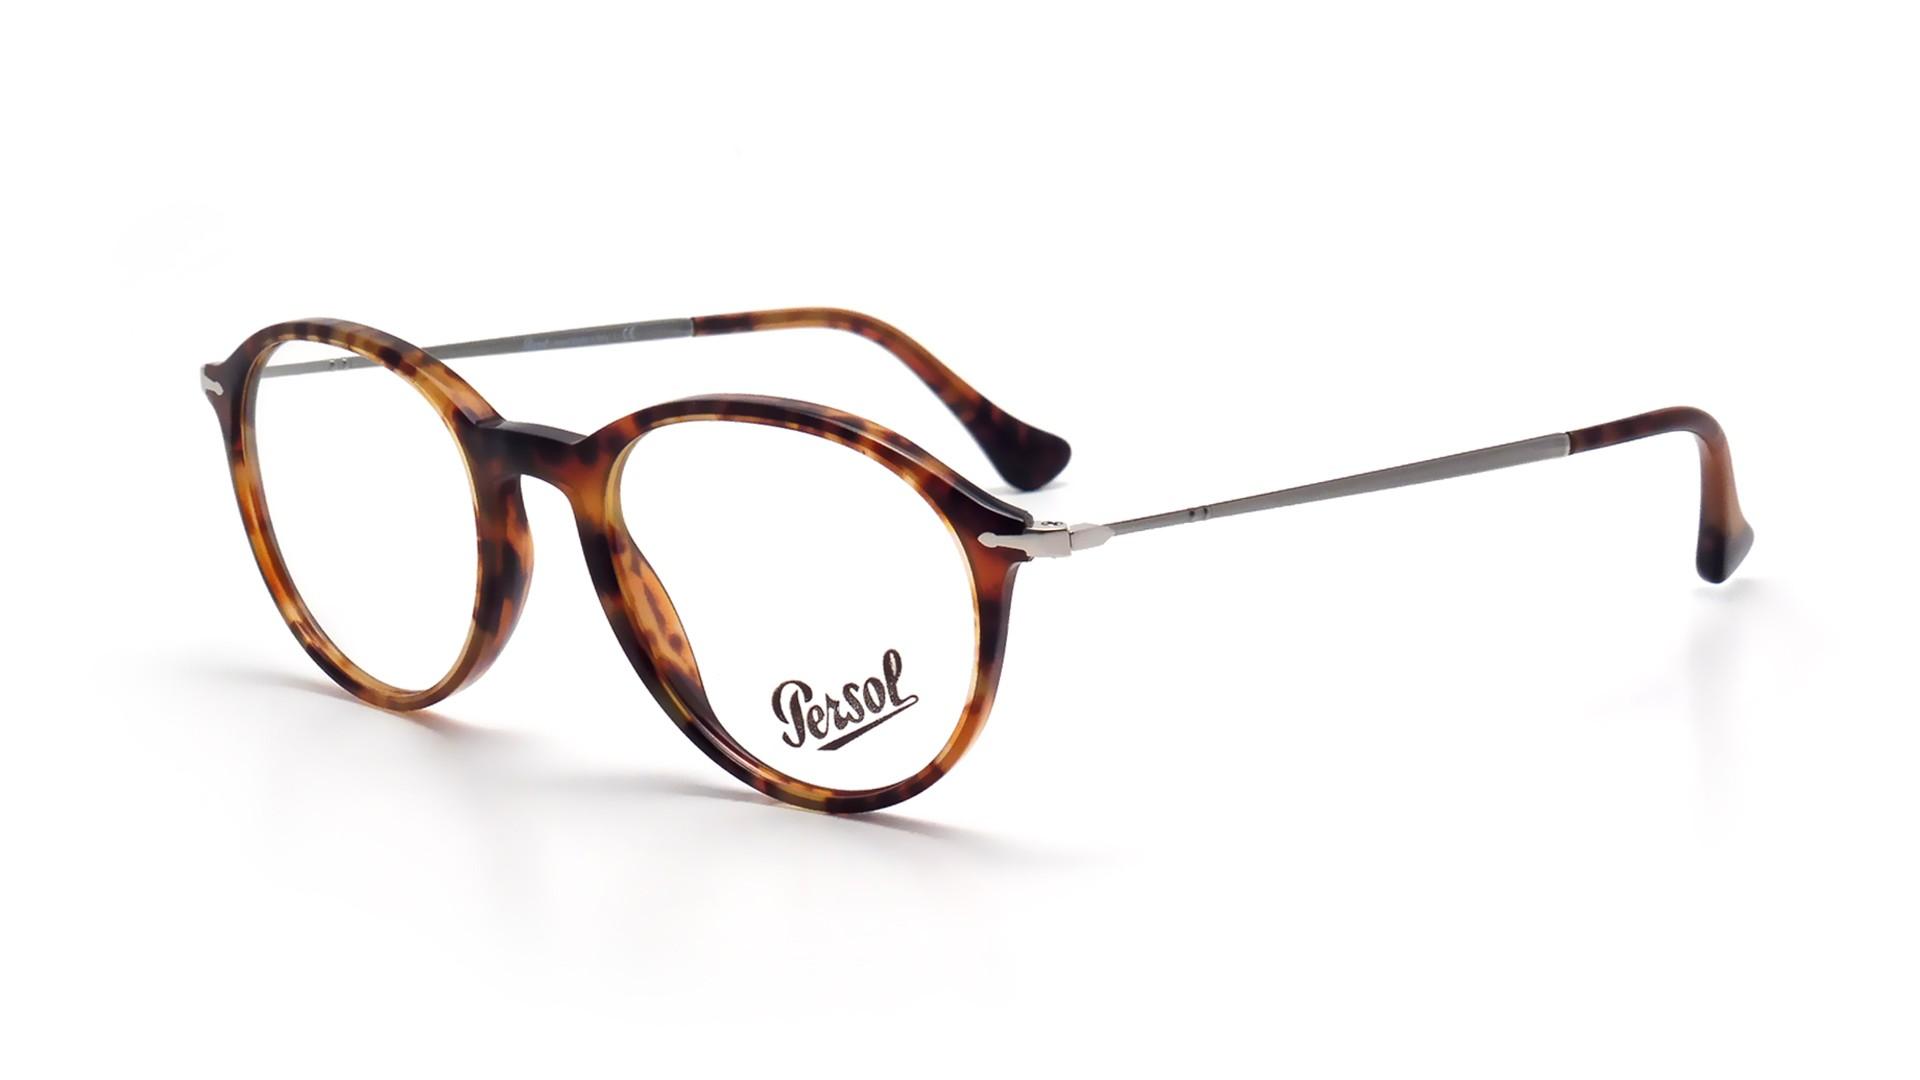 Eyeglasses Persol Reflex Edition Tortoise PO3125V 108 49-19 Medium 633a7620a9ff